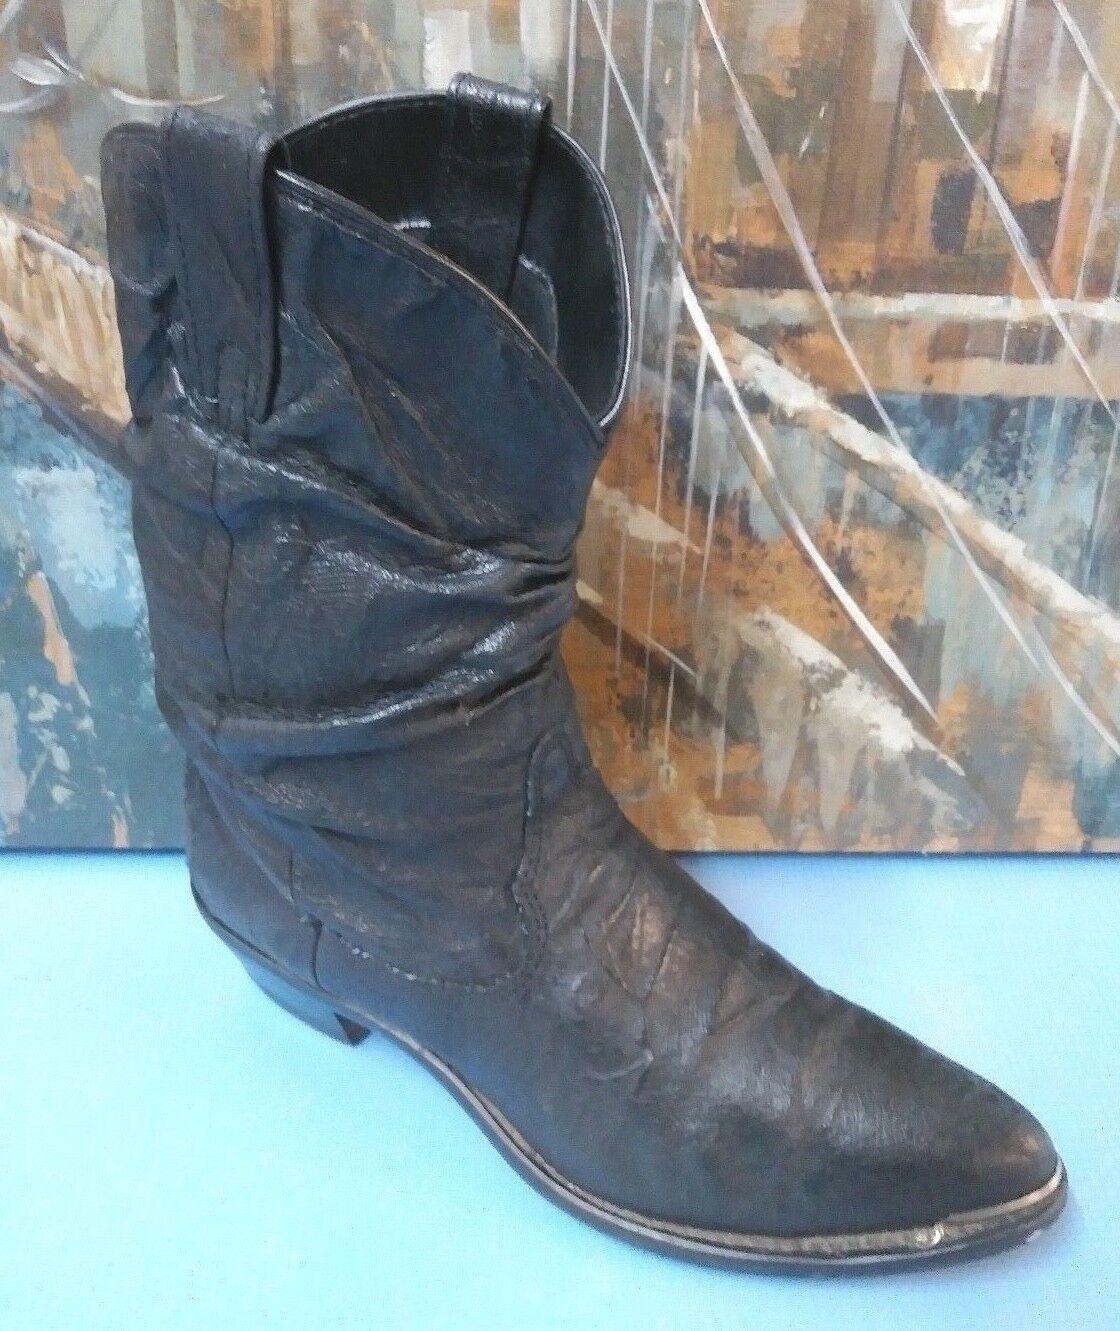 WOMENS DINGO COWBOY LEATHER BLACK BOOTS SIZE 6.5 M STYLE 15014